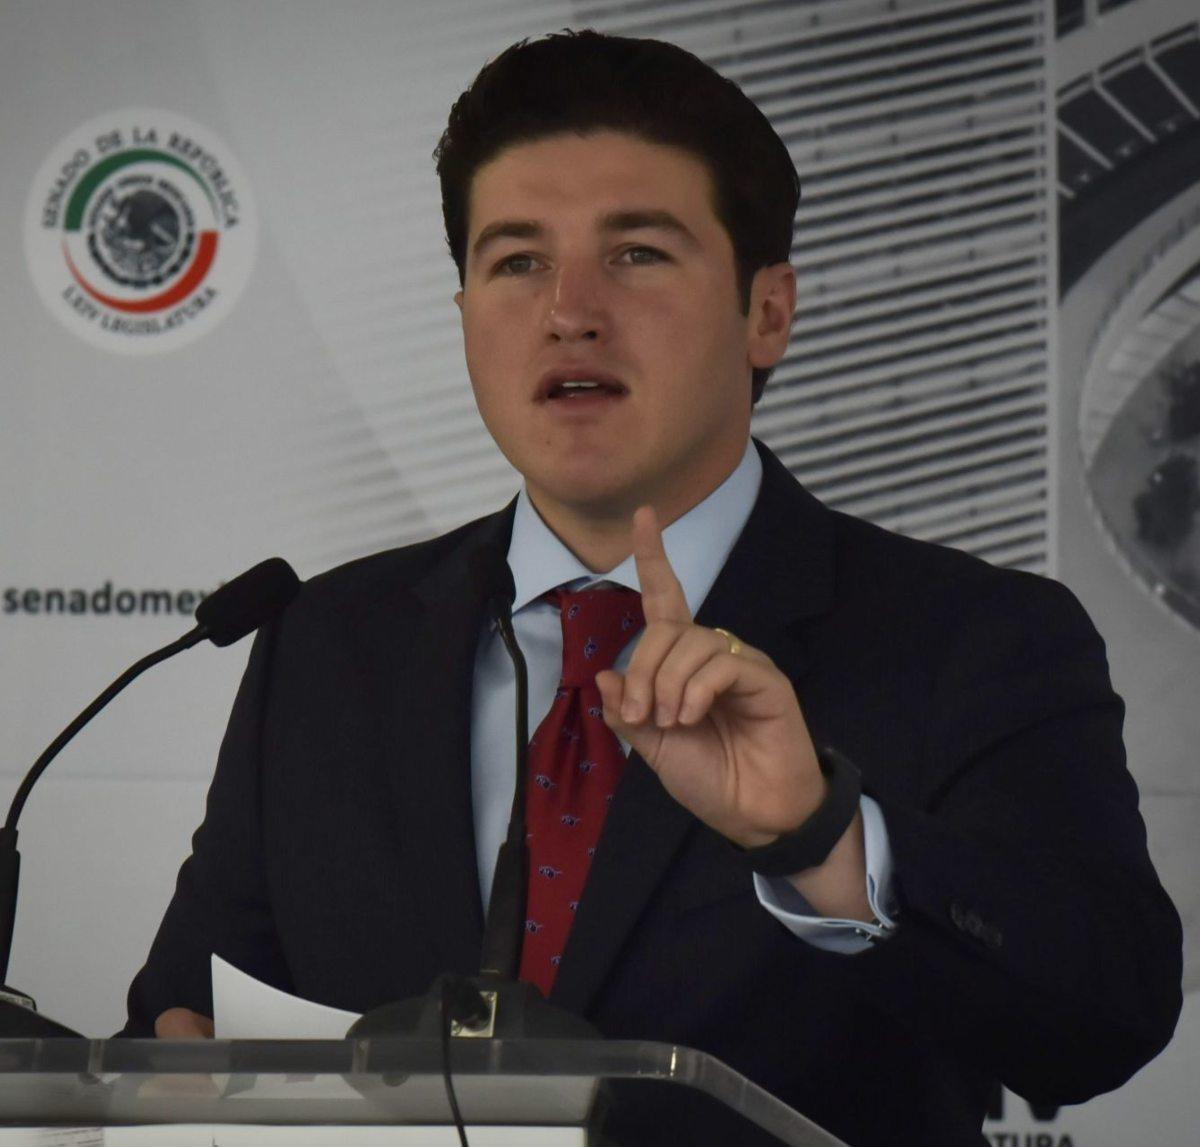 Senadores mexicanos sueldo